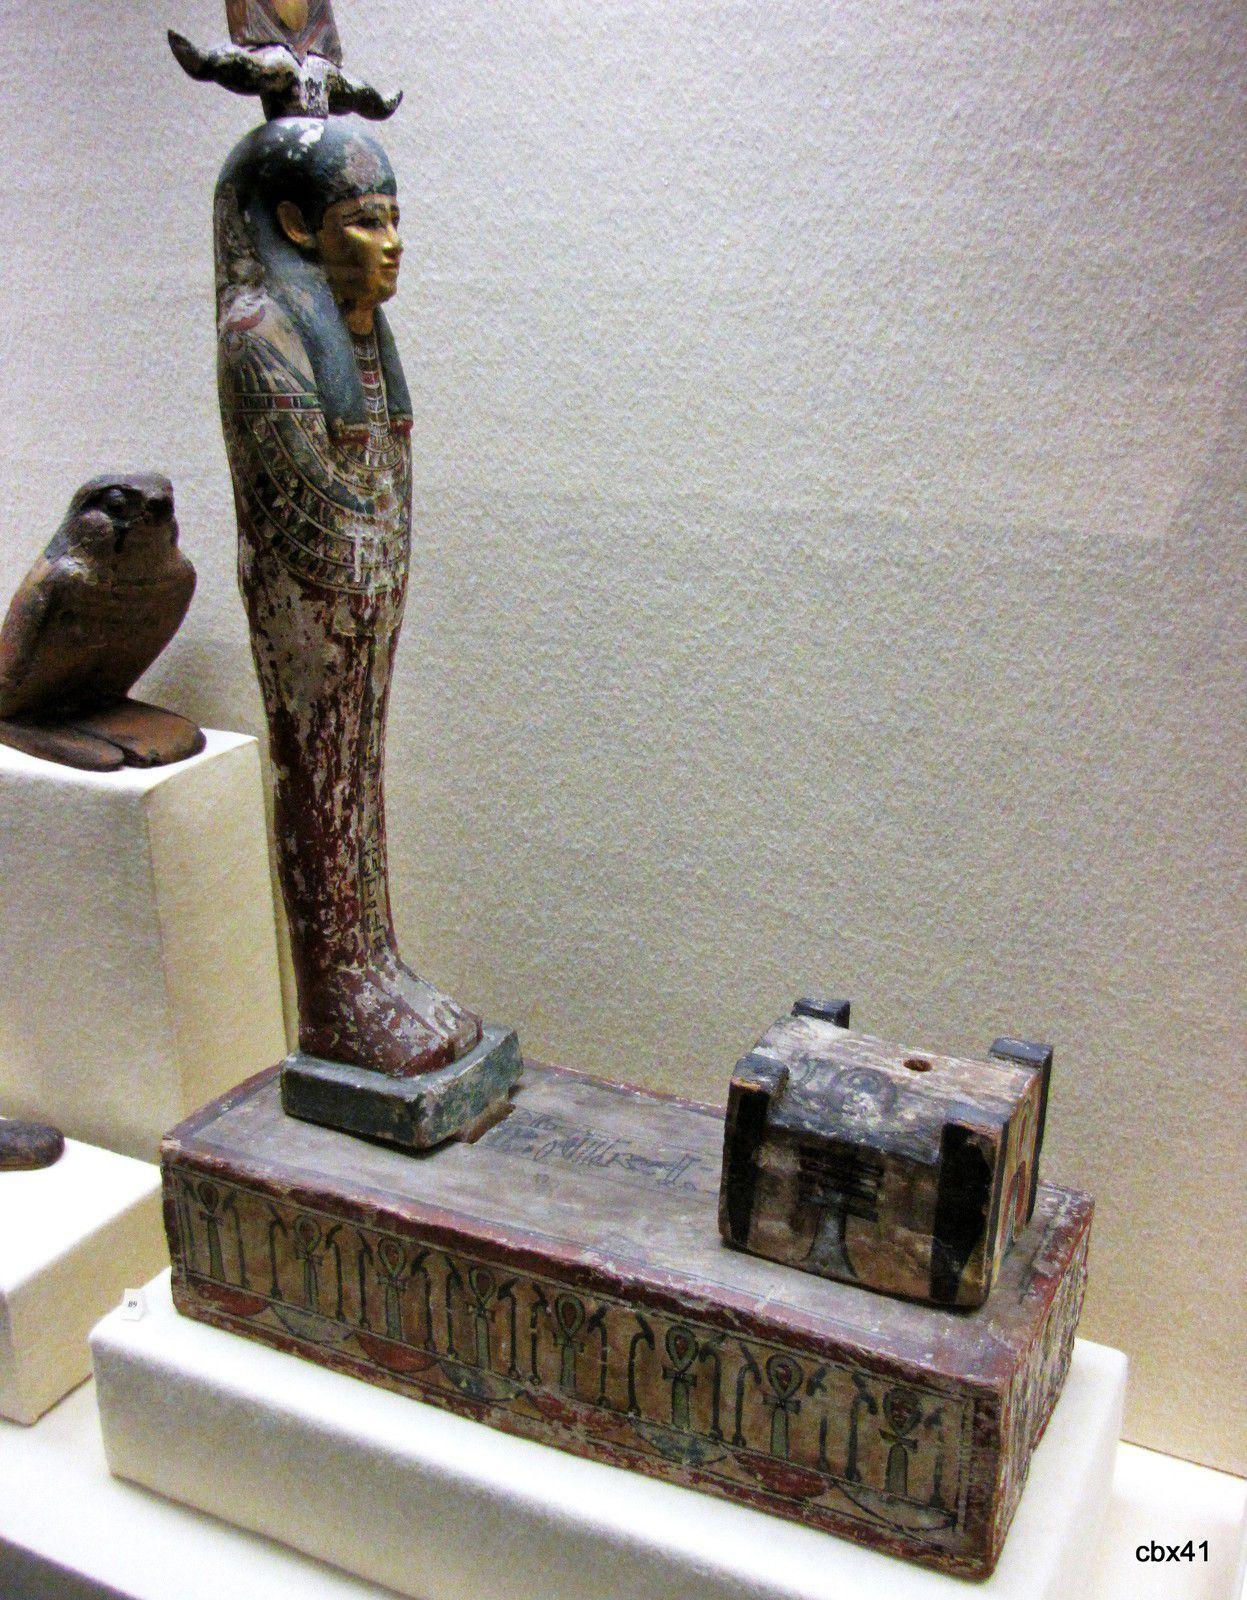 Statuette de Ptah-Sokar-Osiris au nom d'Horresnet